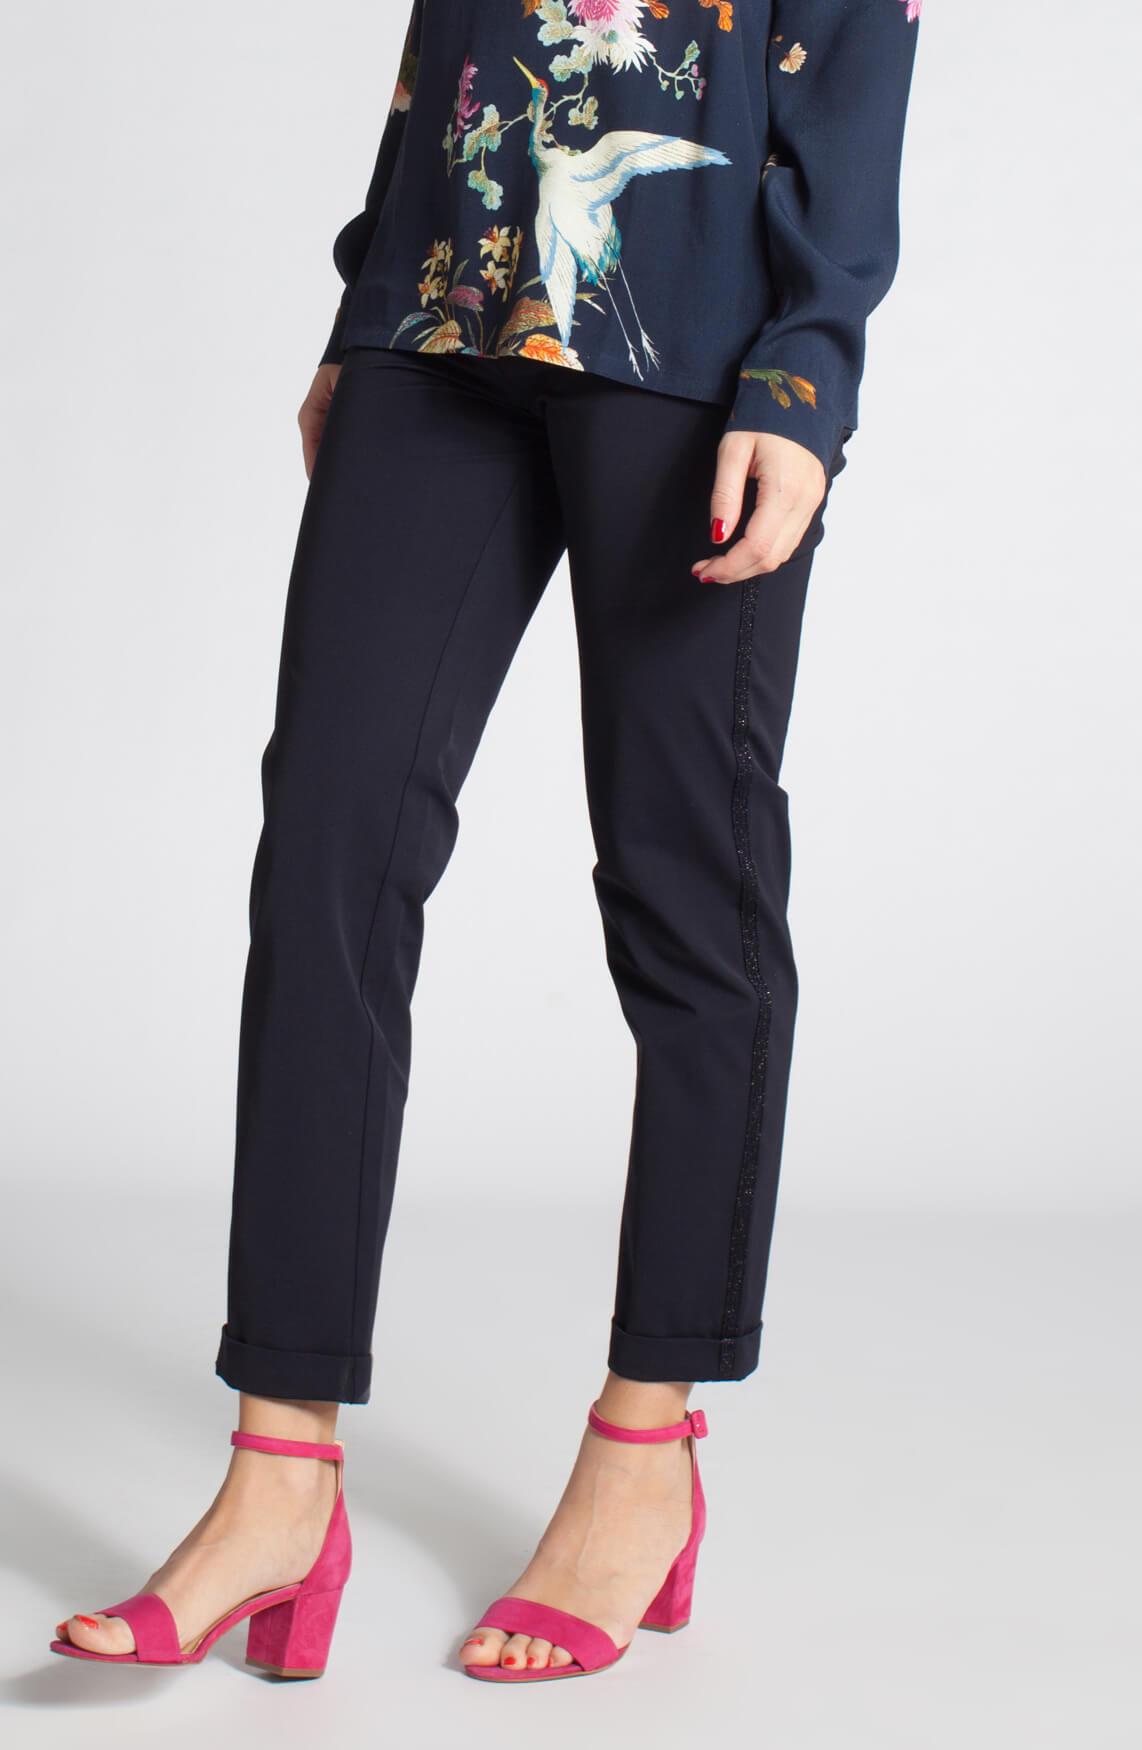 Rosner Dames Audrey pantalon met glitterbies